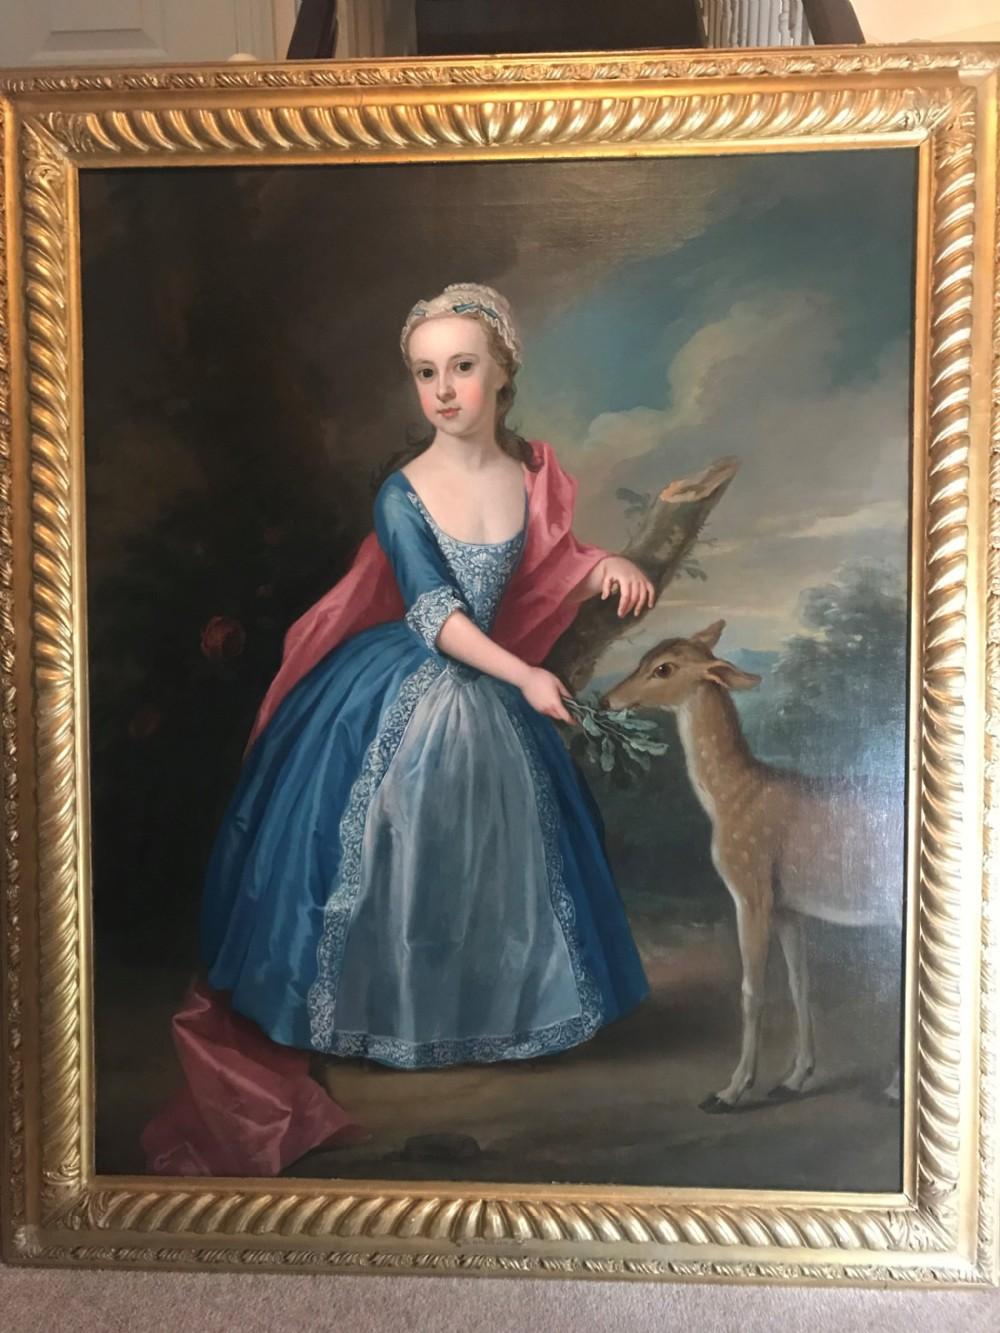 portrait of a girl feeding a deer c1720 by thomas gibson